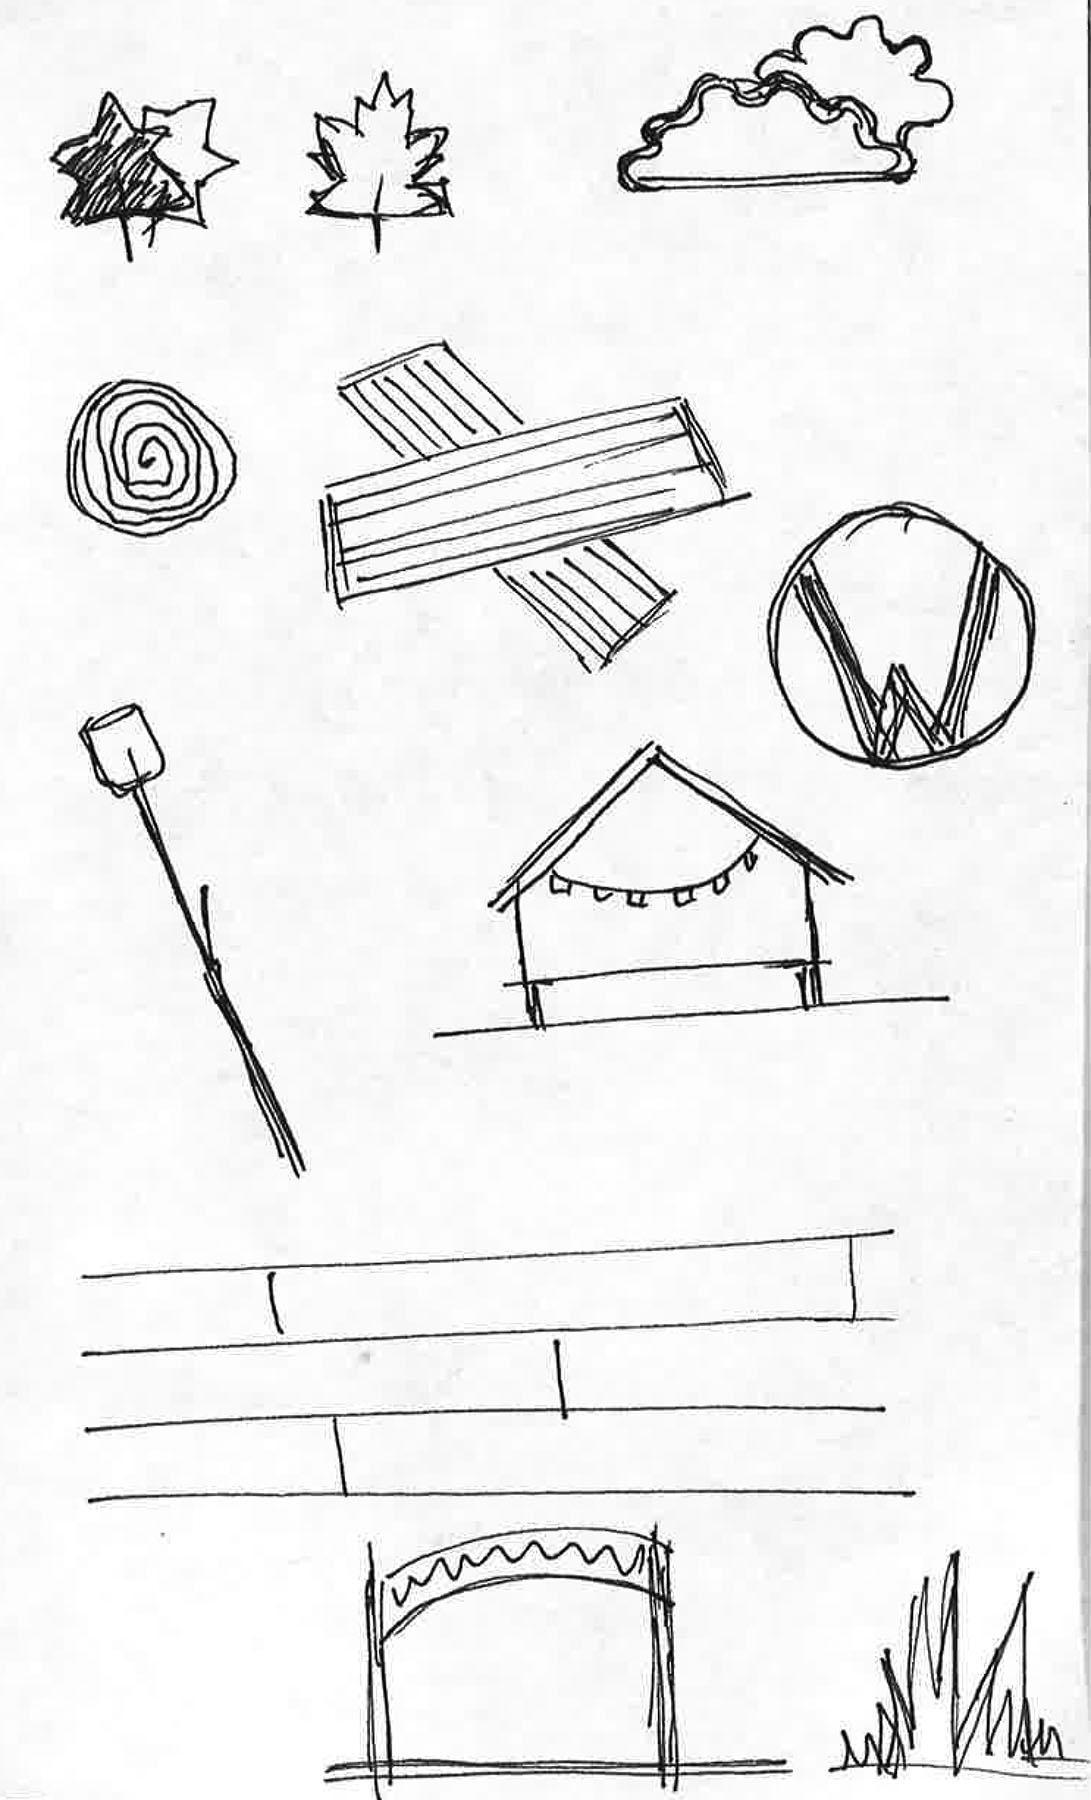 Camp Waubanong - image 3 - student project